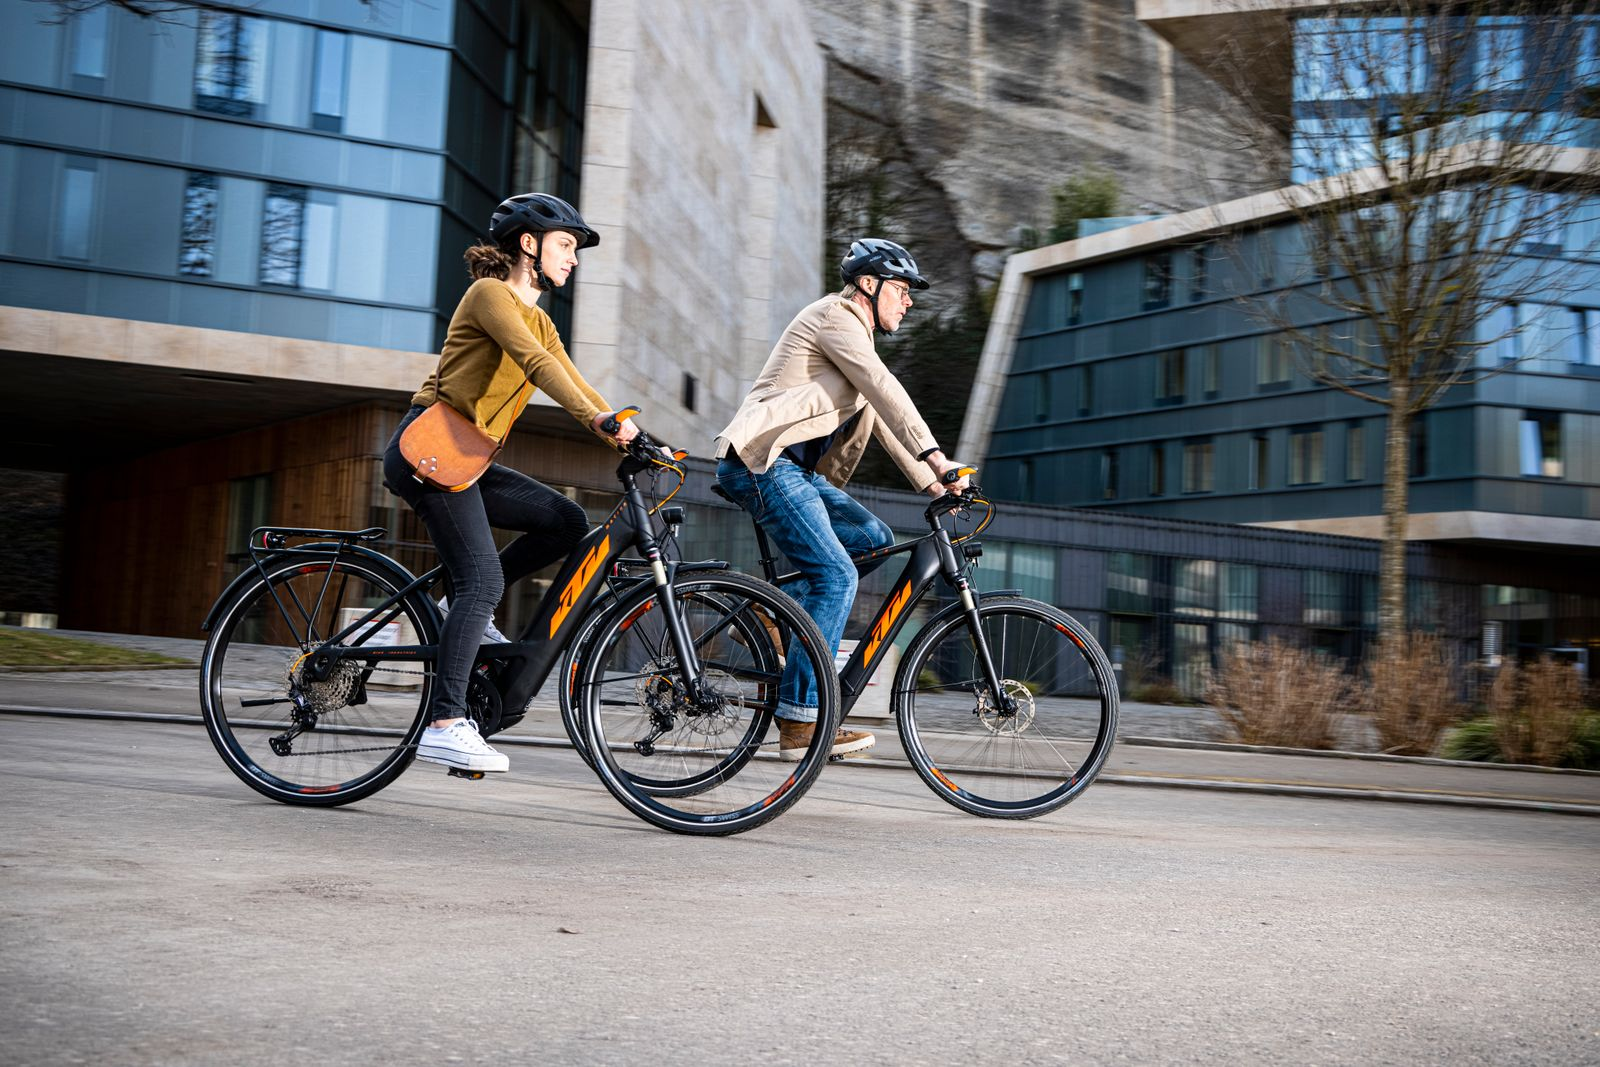 KTM / Fahrrad / City / Jobrad / ebike